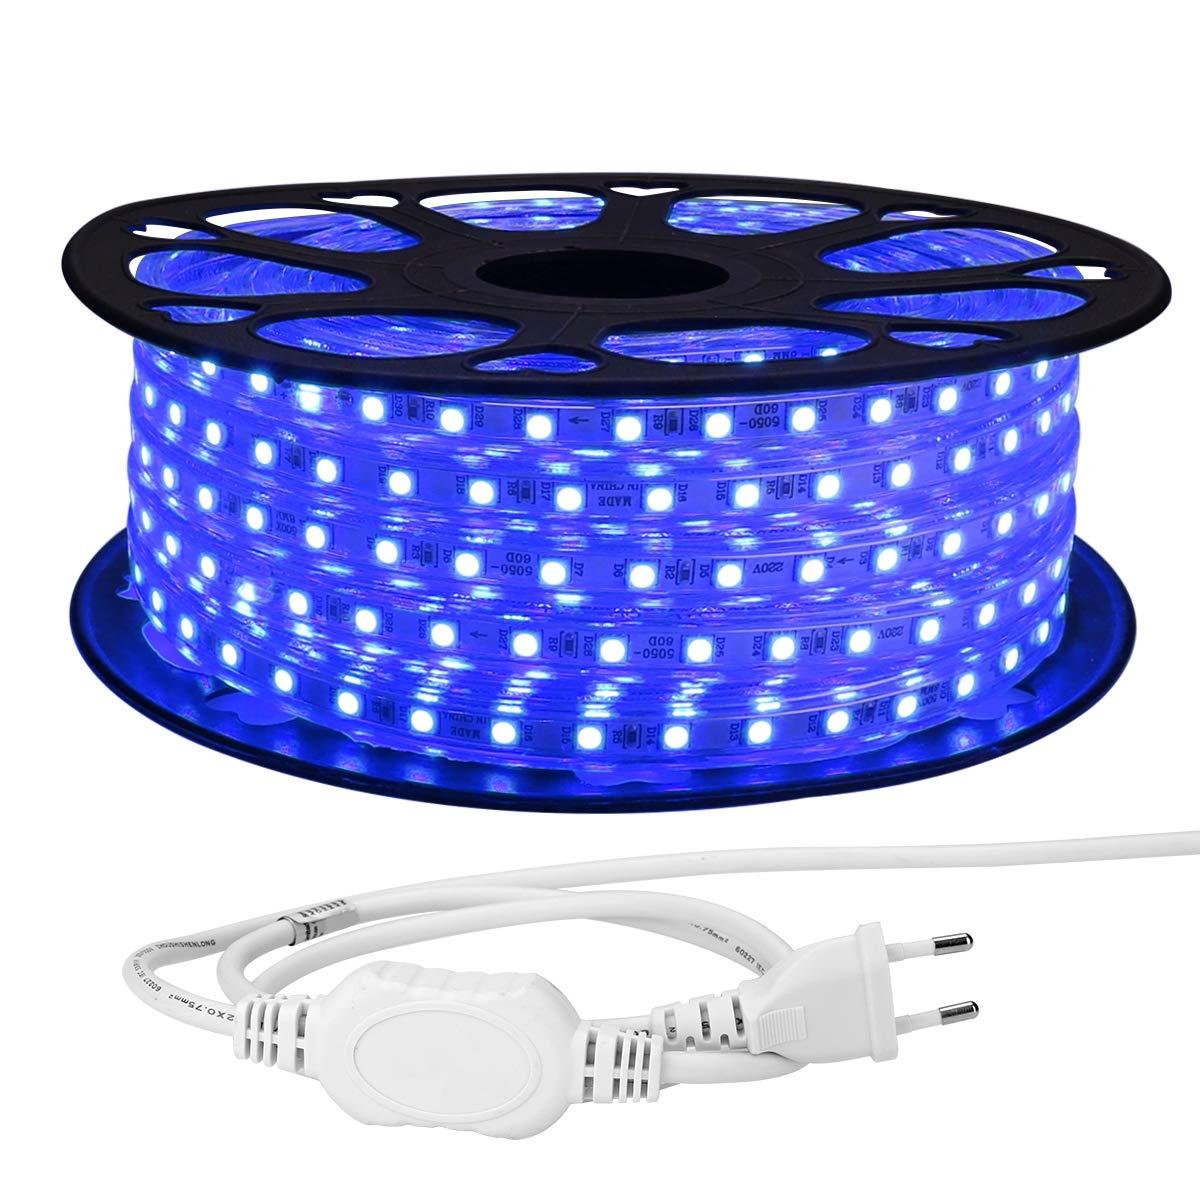 LE Striscia LED 25m 220V-240V, Blu Super Luminoso, Luci Decorative Esterne Impermeabili IP65